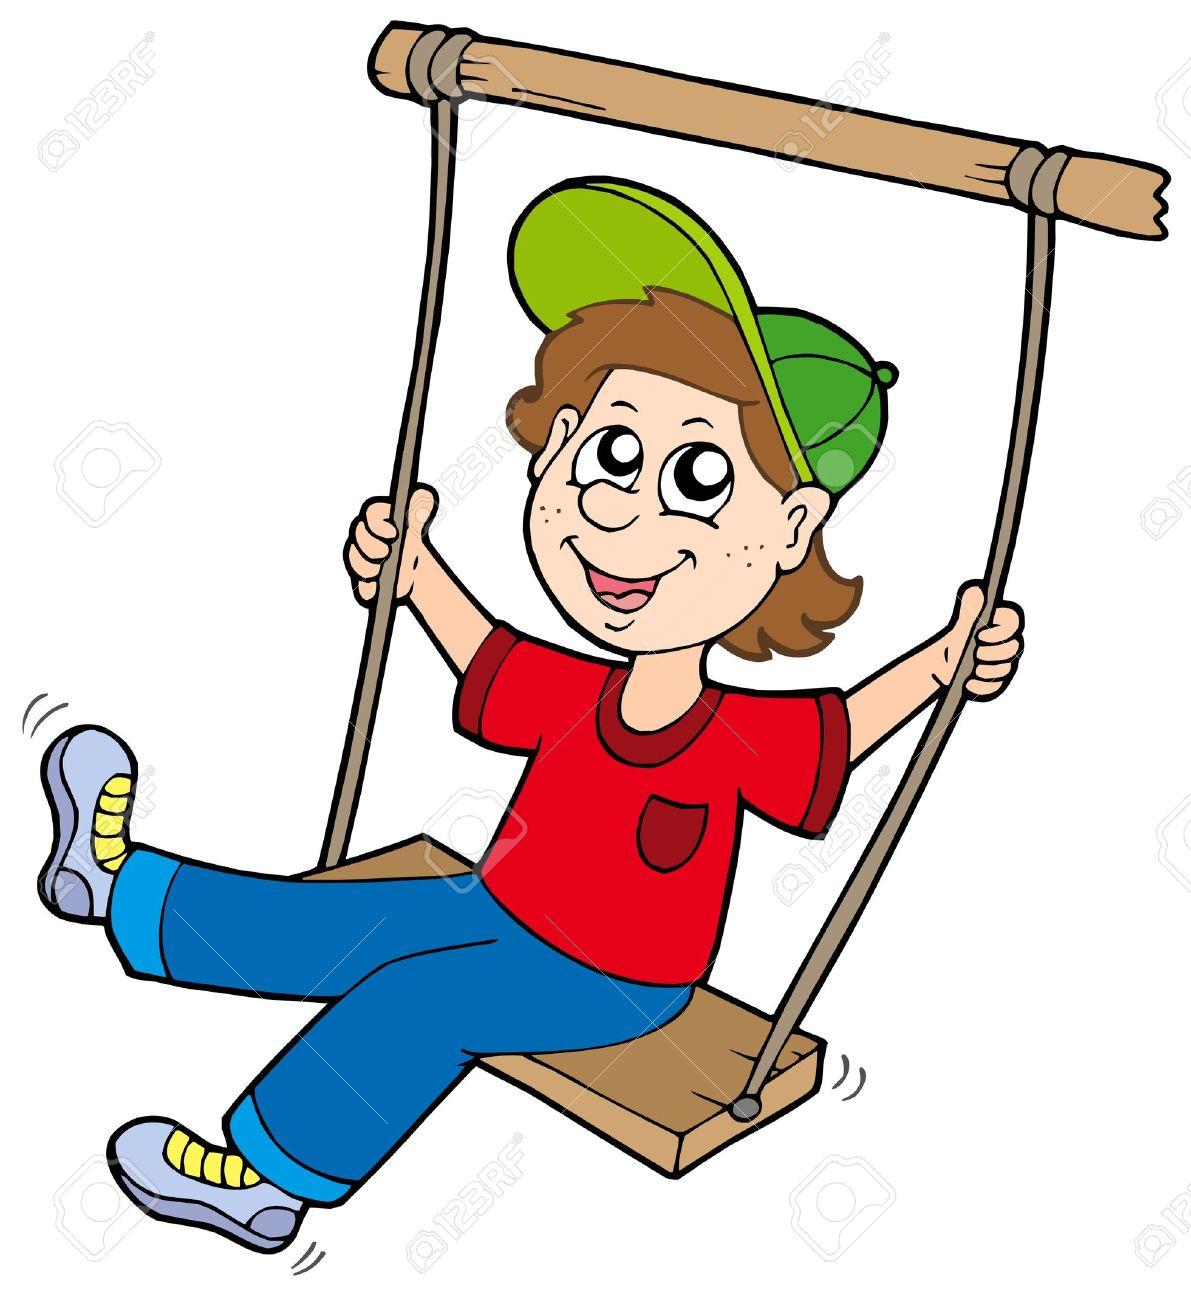 swing clipart-swing clipart-1